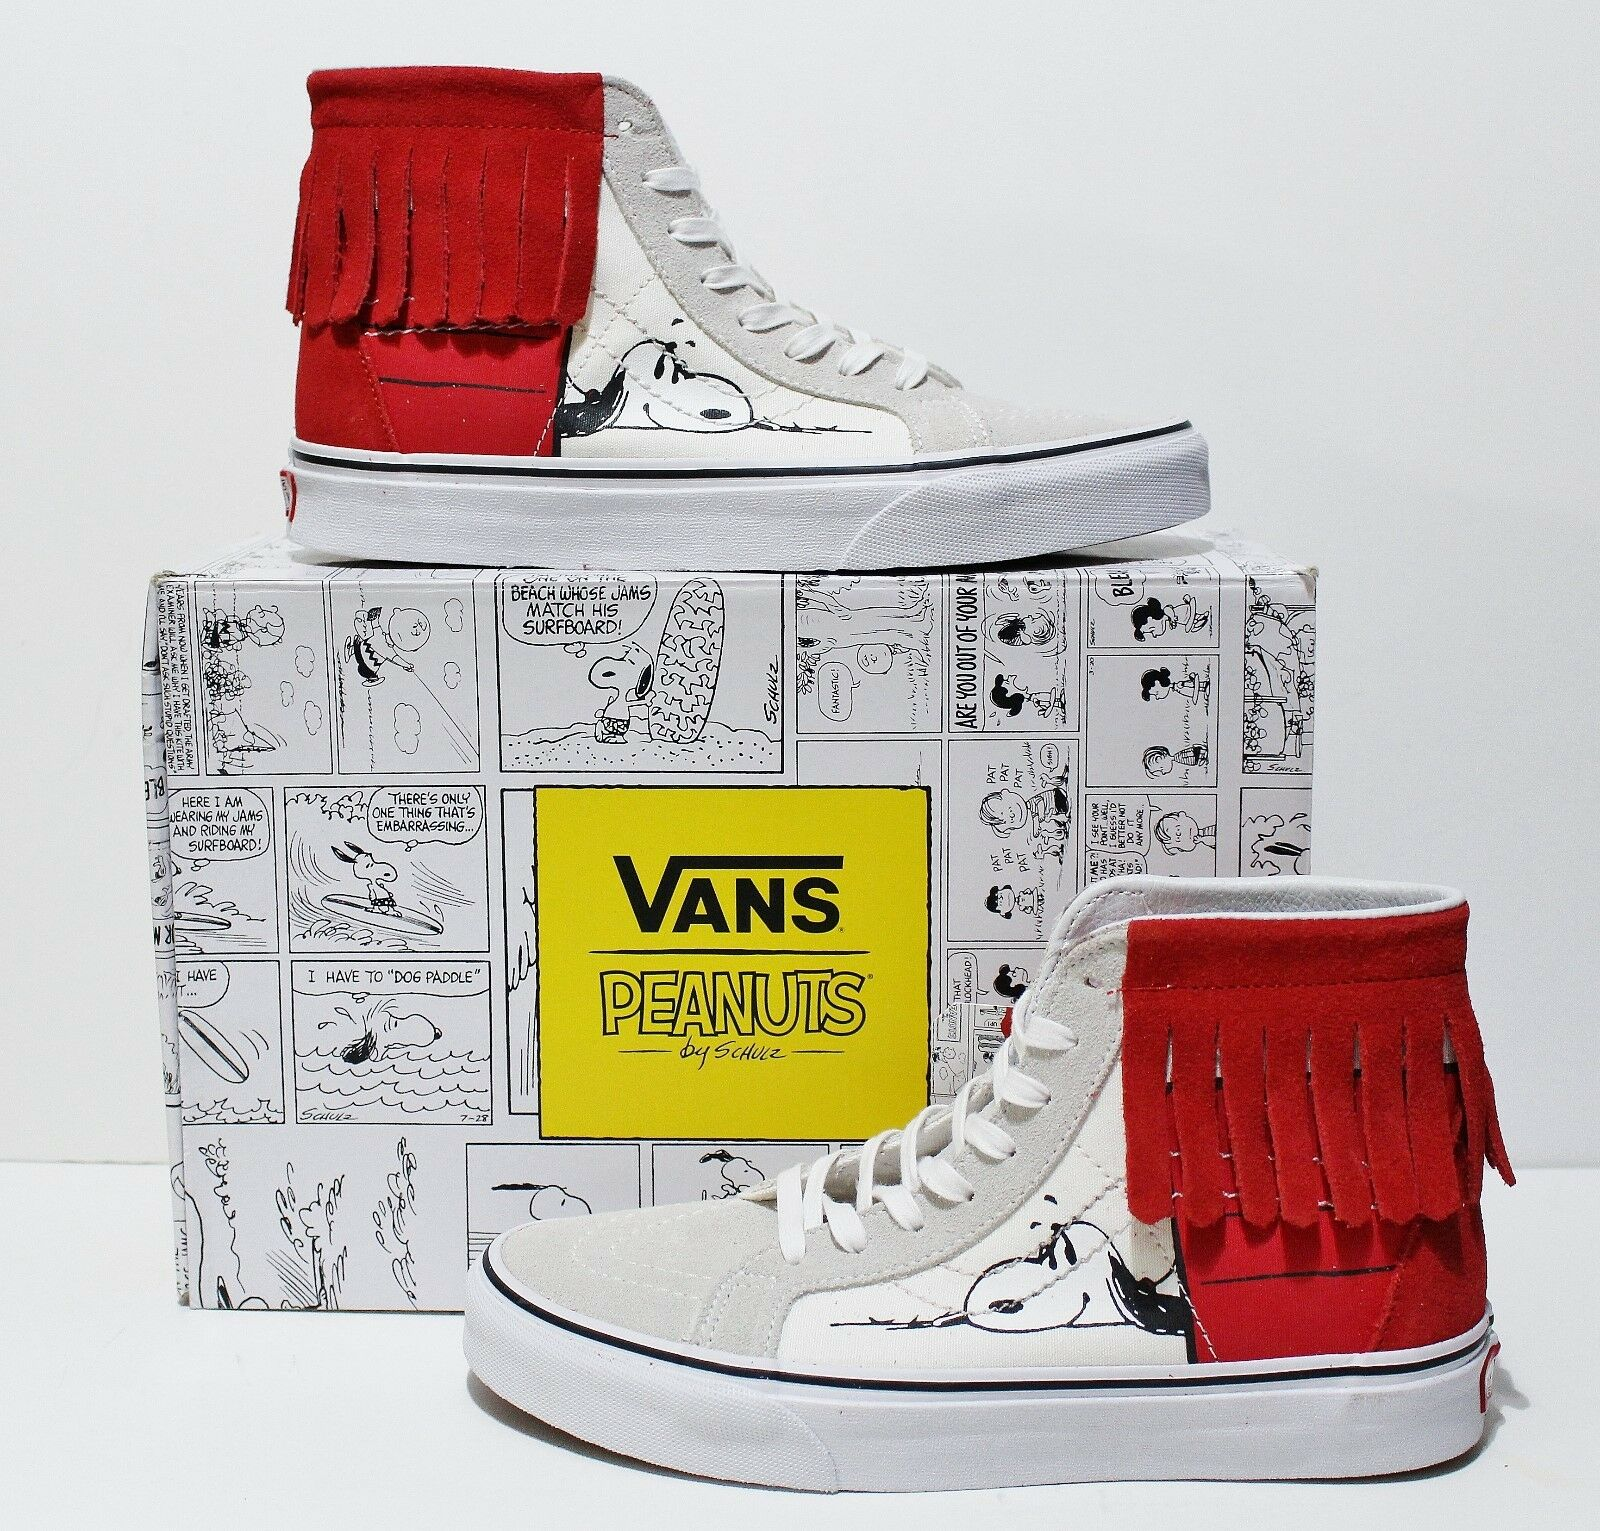 Vans X Peanuts SK8 Hi Moc Dog House Bone White Red Women's Size  7